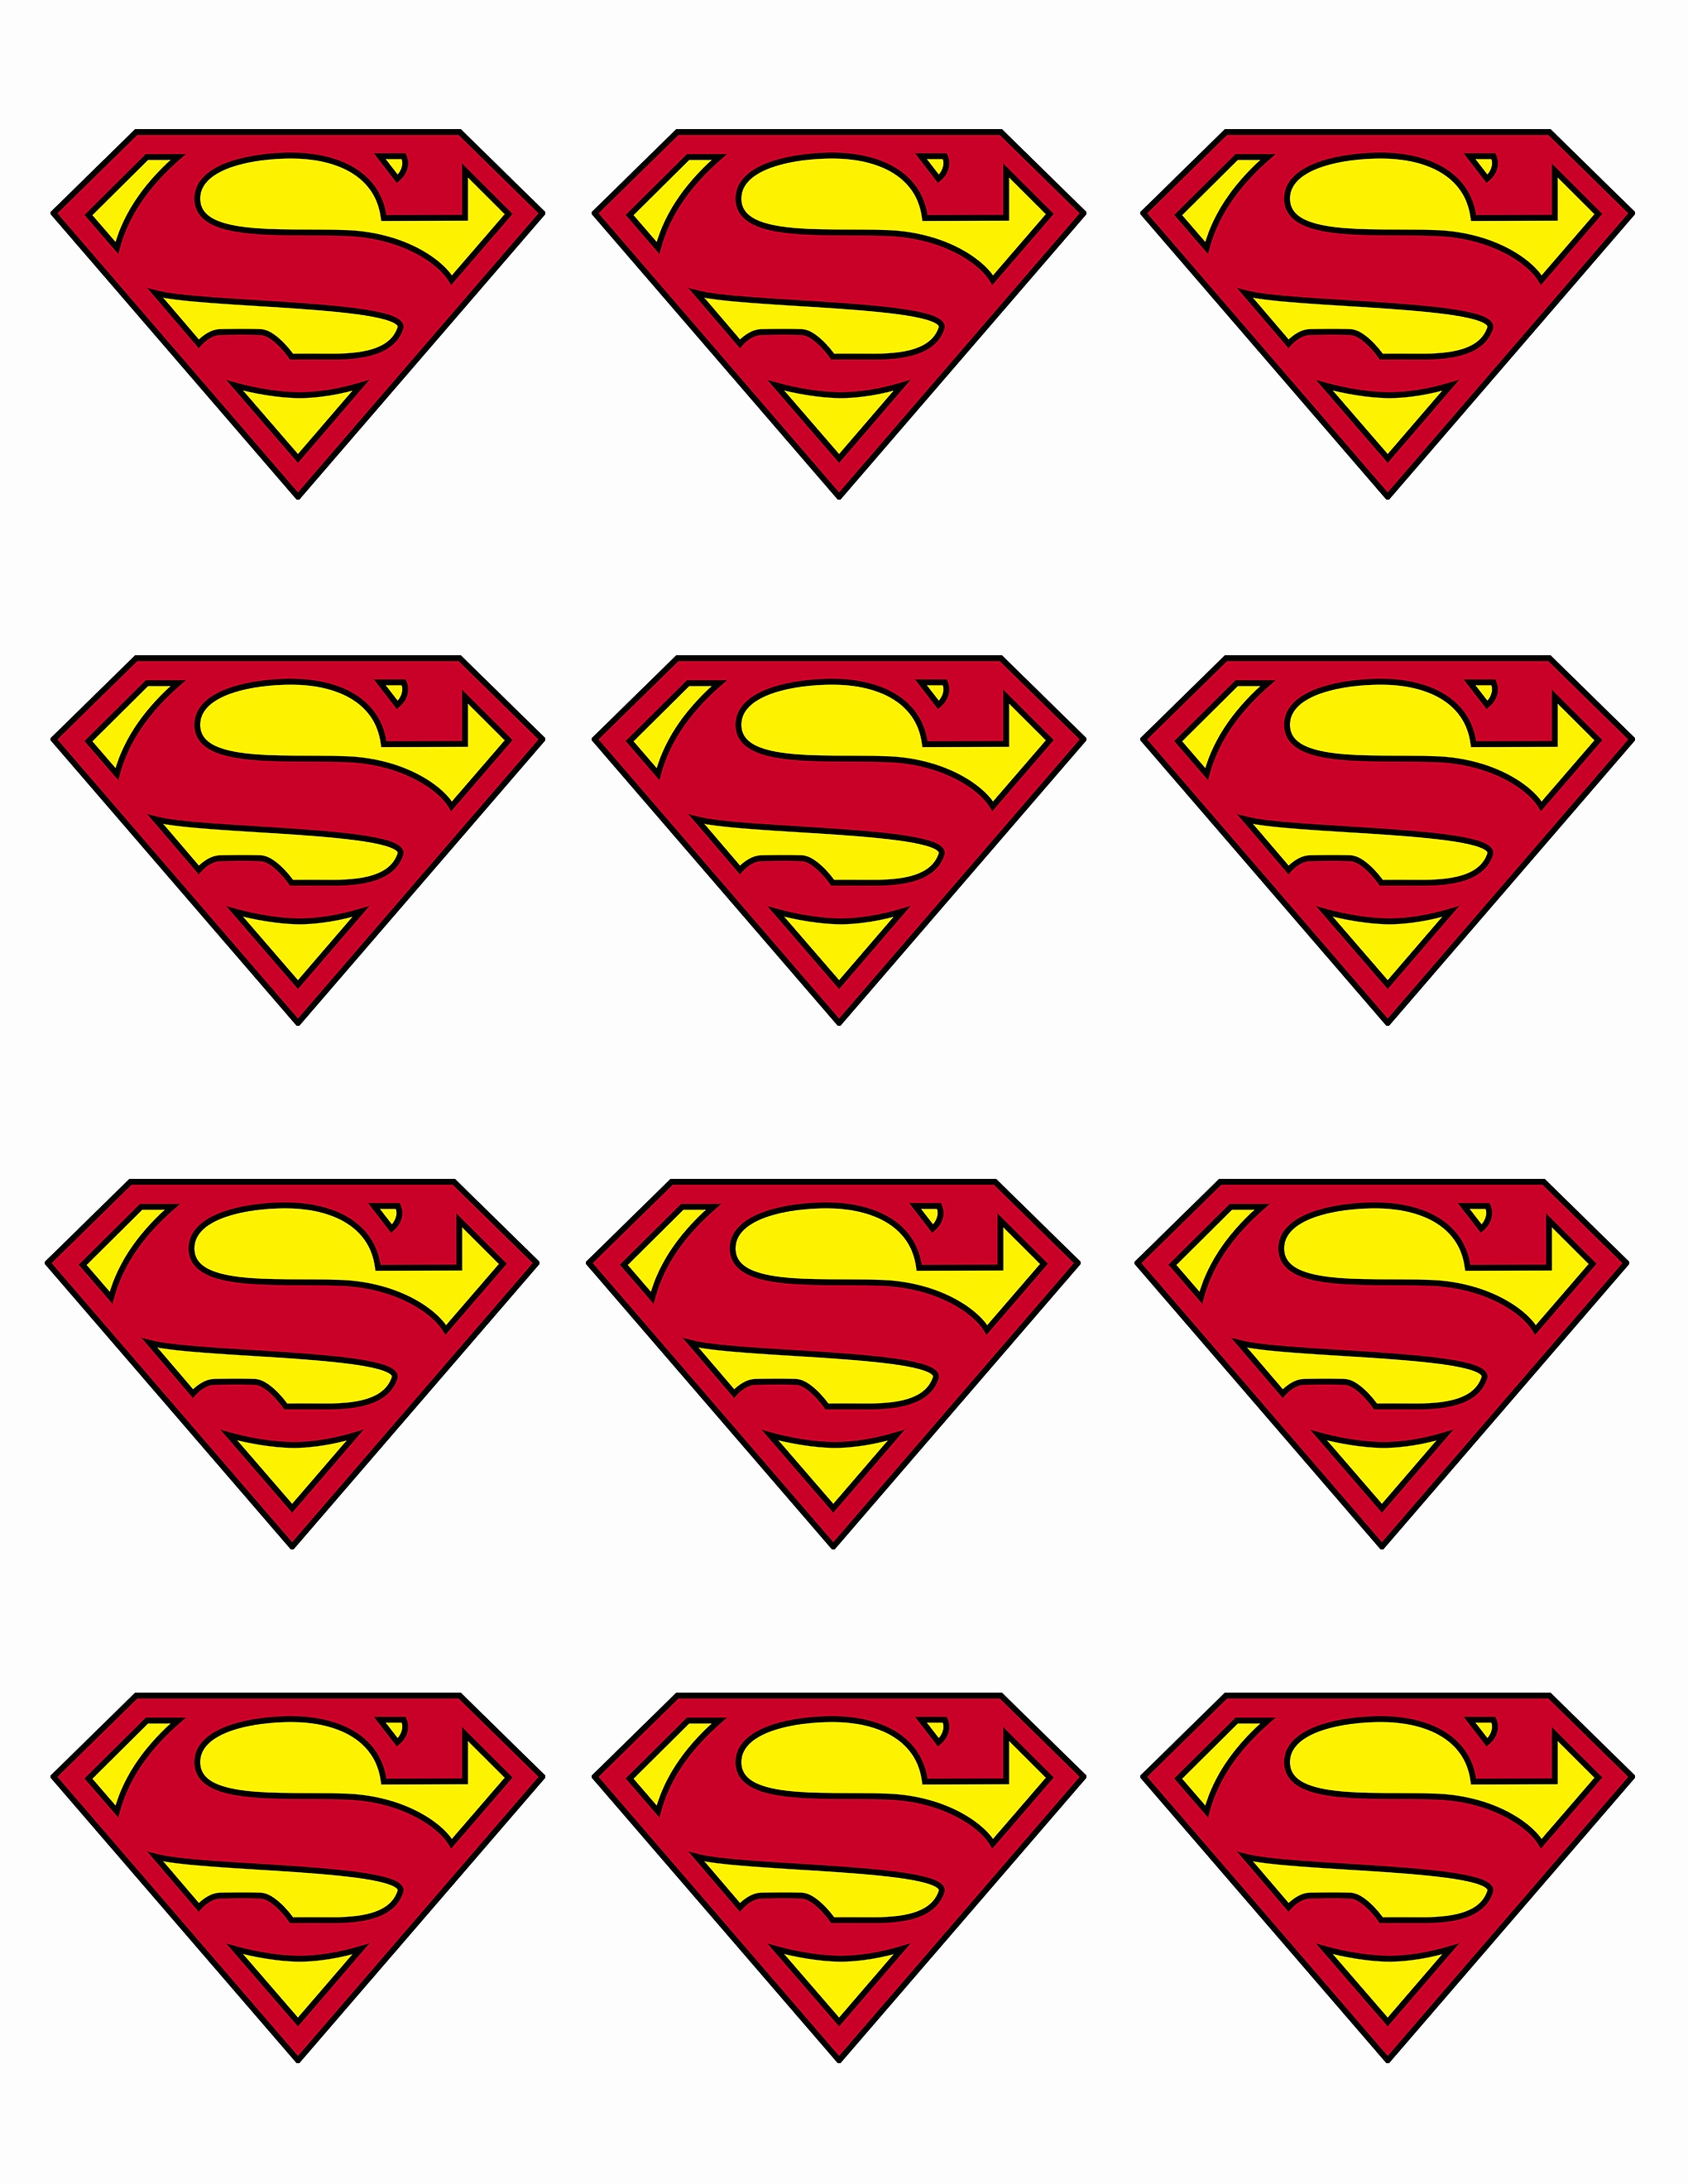 2040x2640 Superheroes Logos Printable Awesome Clip Art Superhero Logos